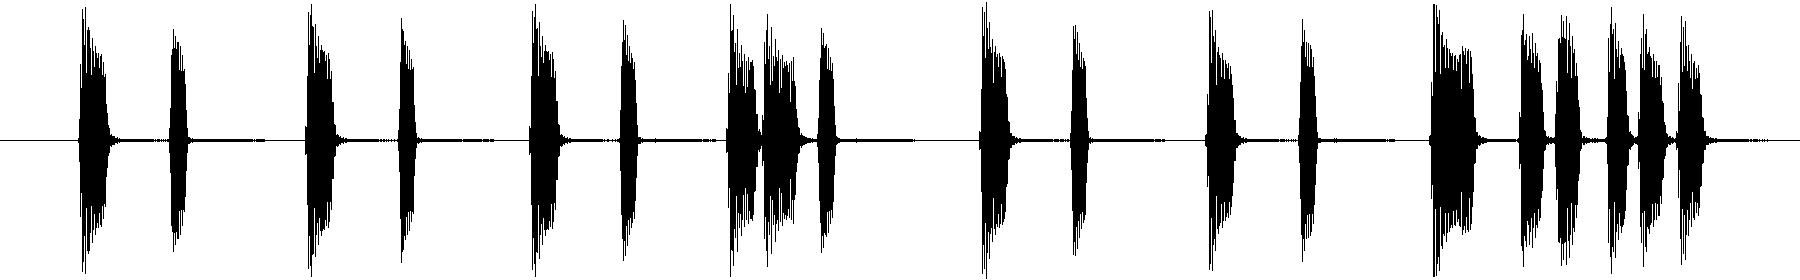 253068 11 bassloop experimental wav